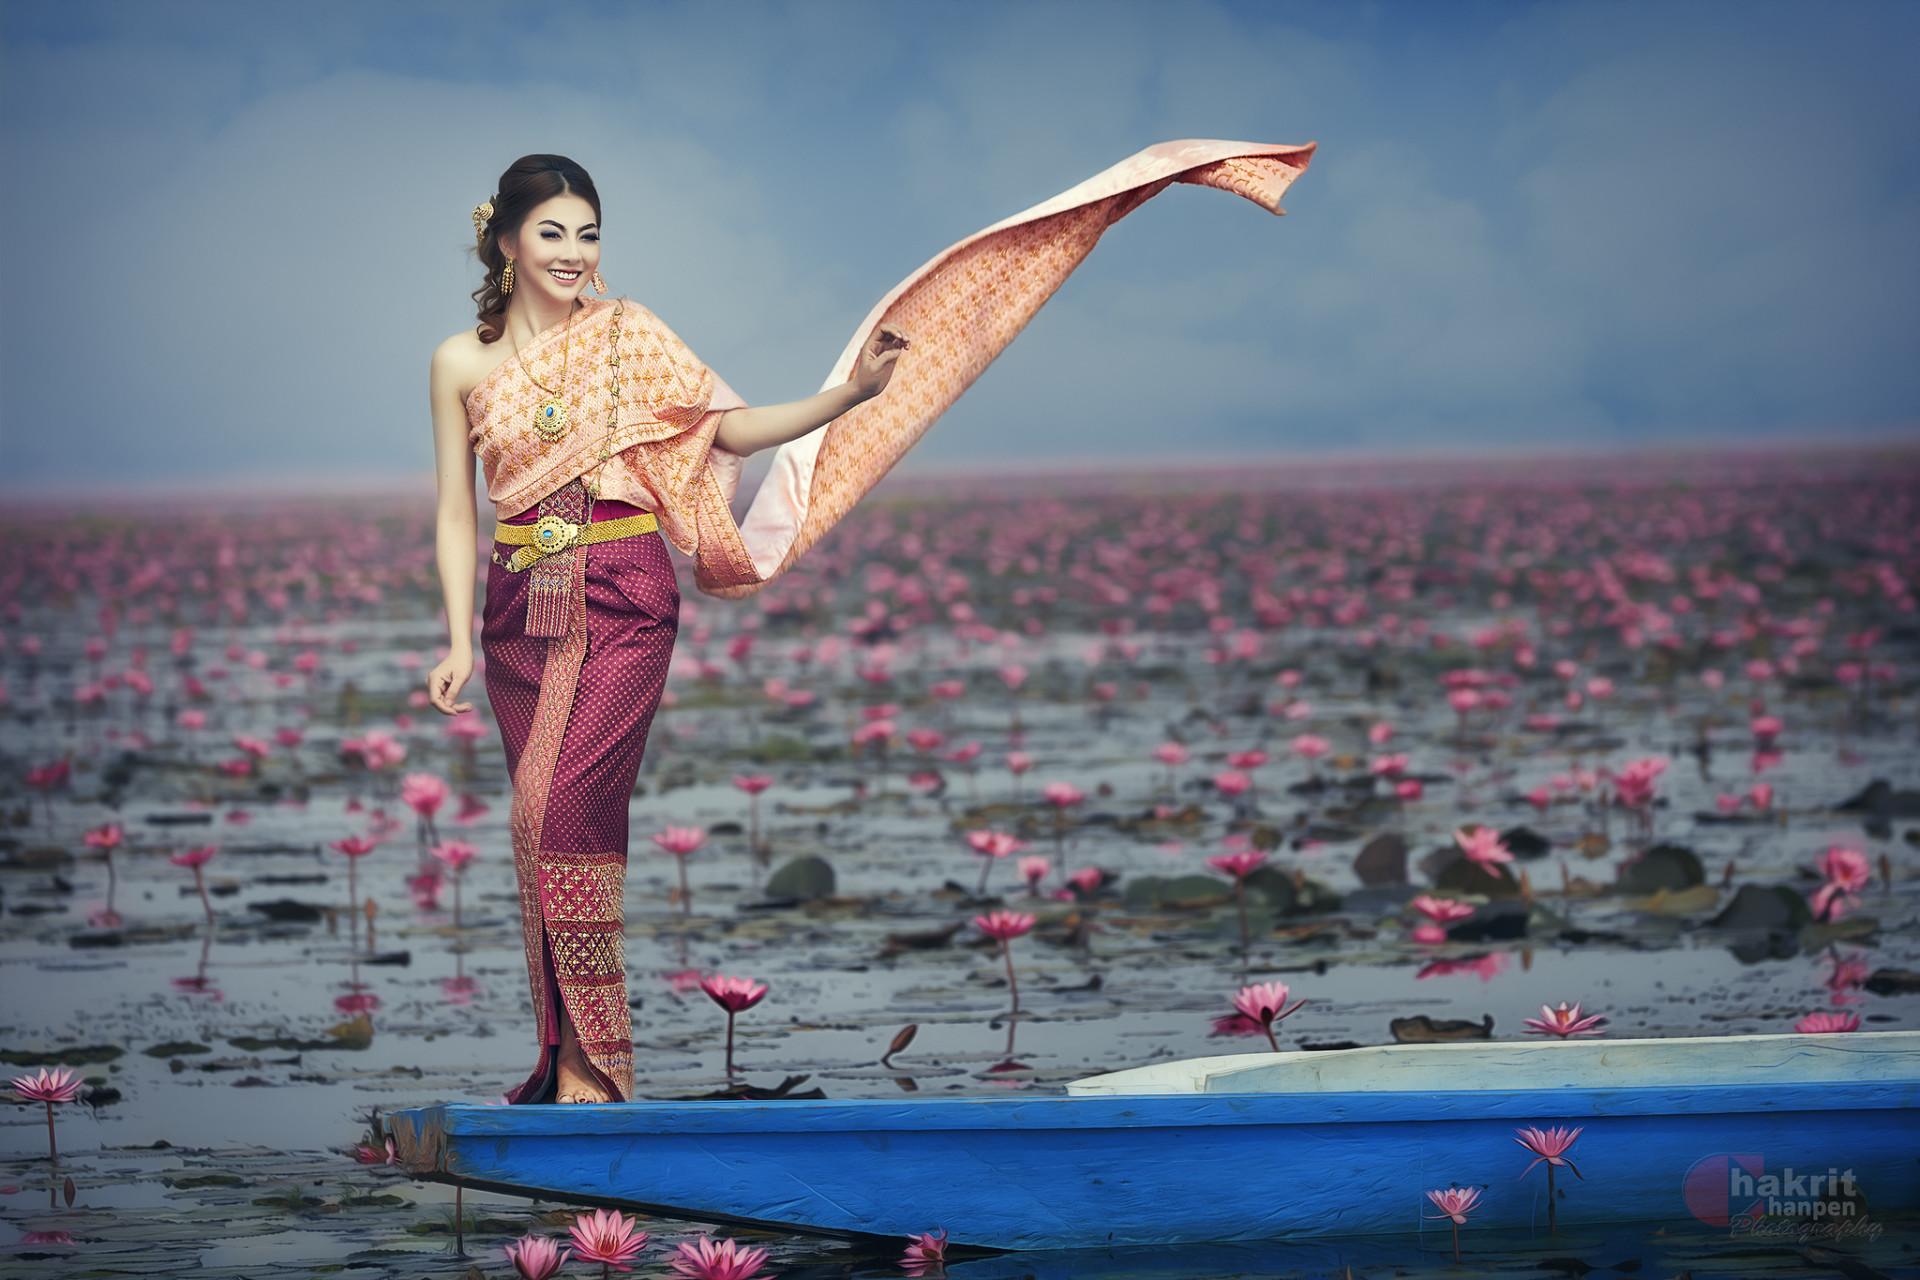 Photography Oriental Flower Boat National Dress Asian Thai Woman Girl  Wallpaper